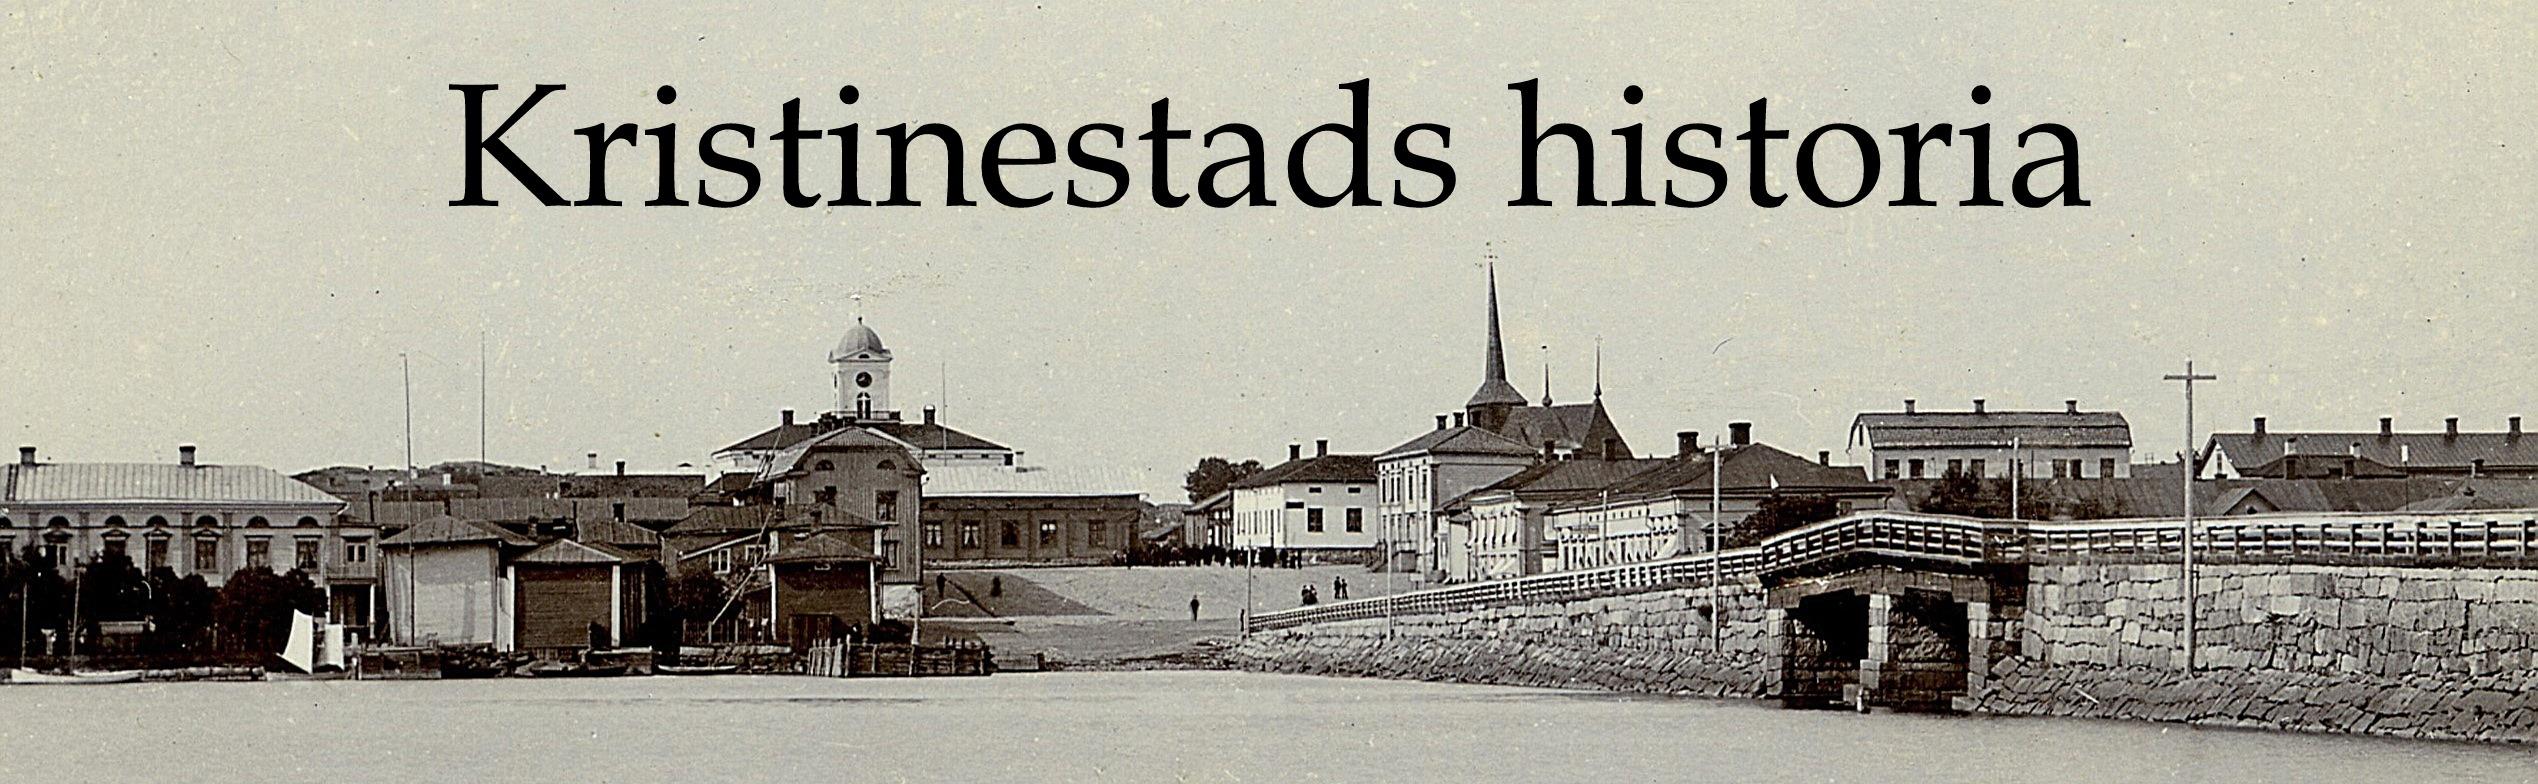 Kristinestads historia